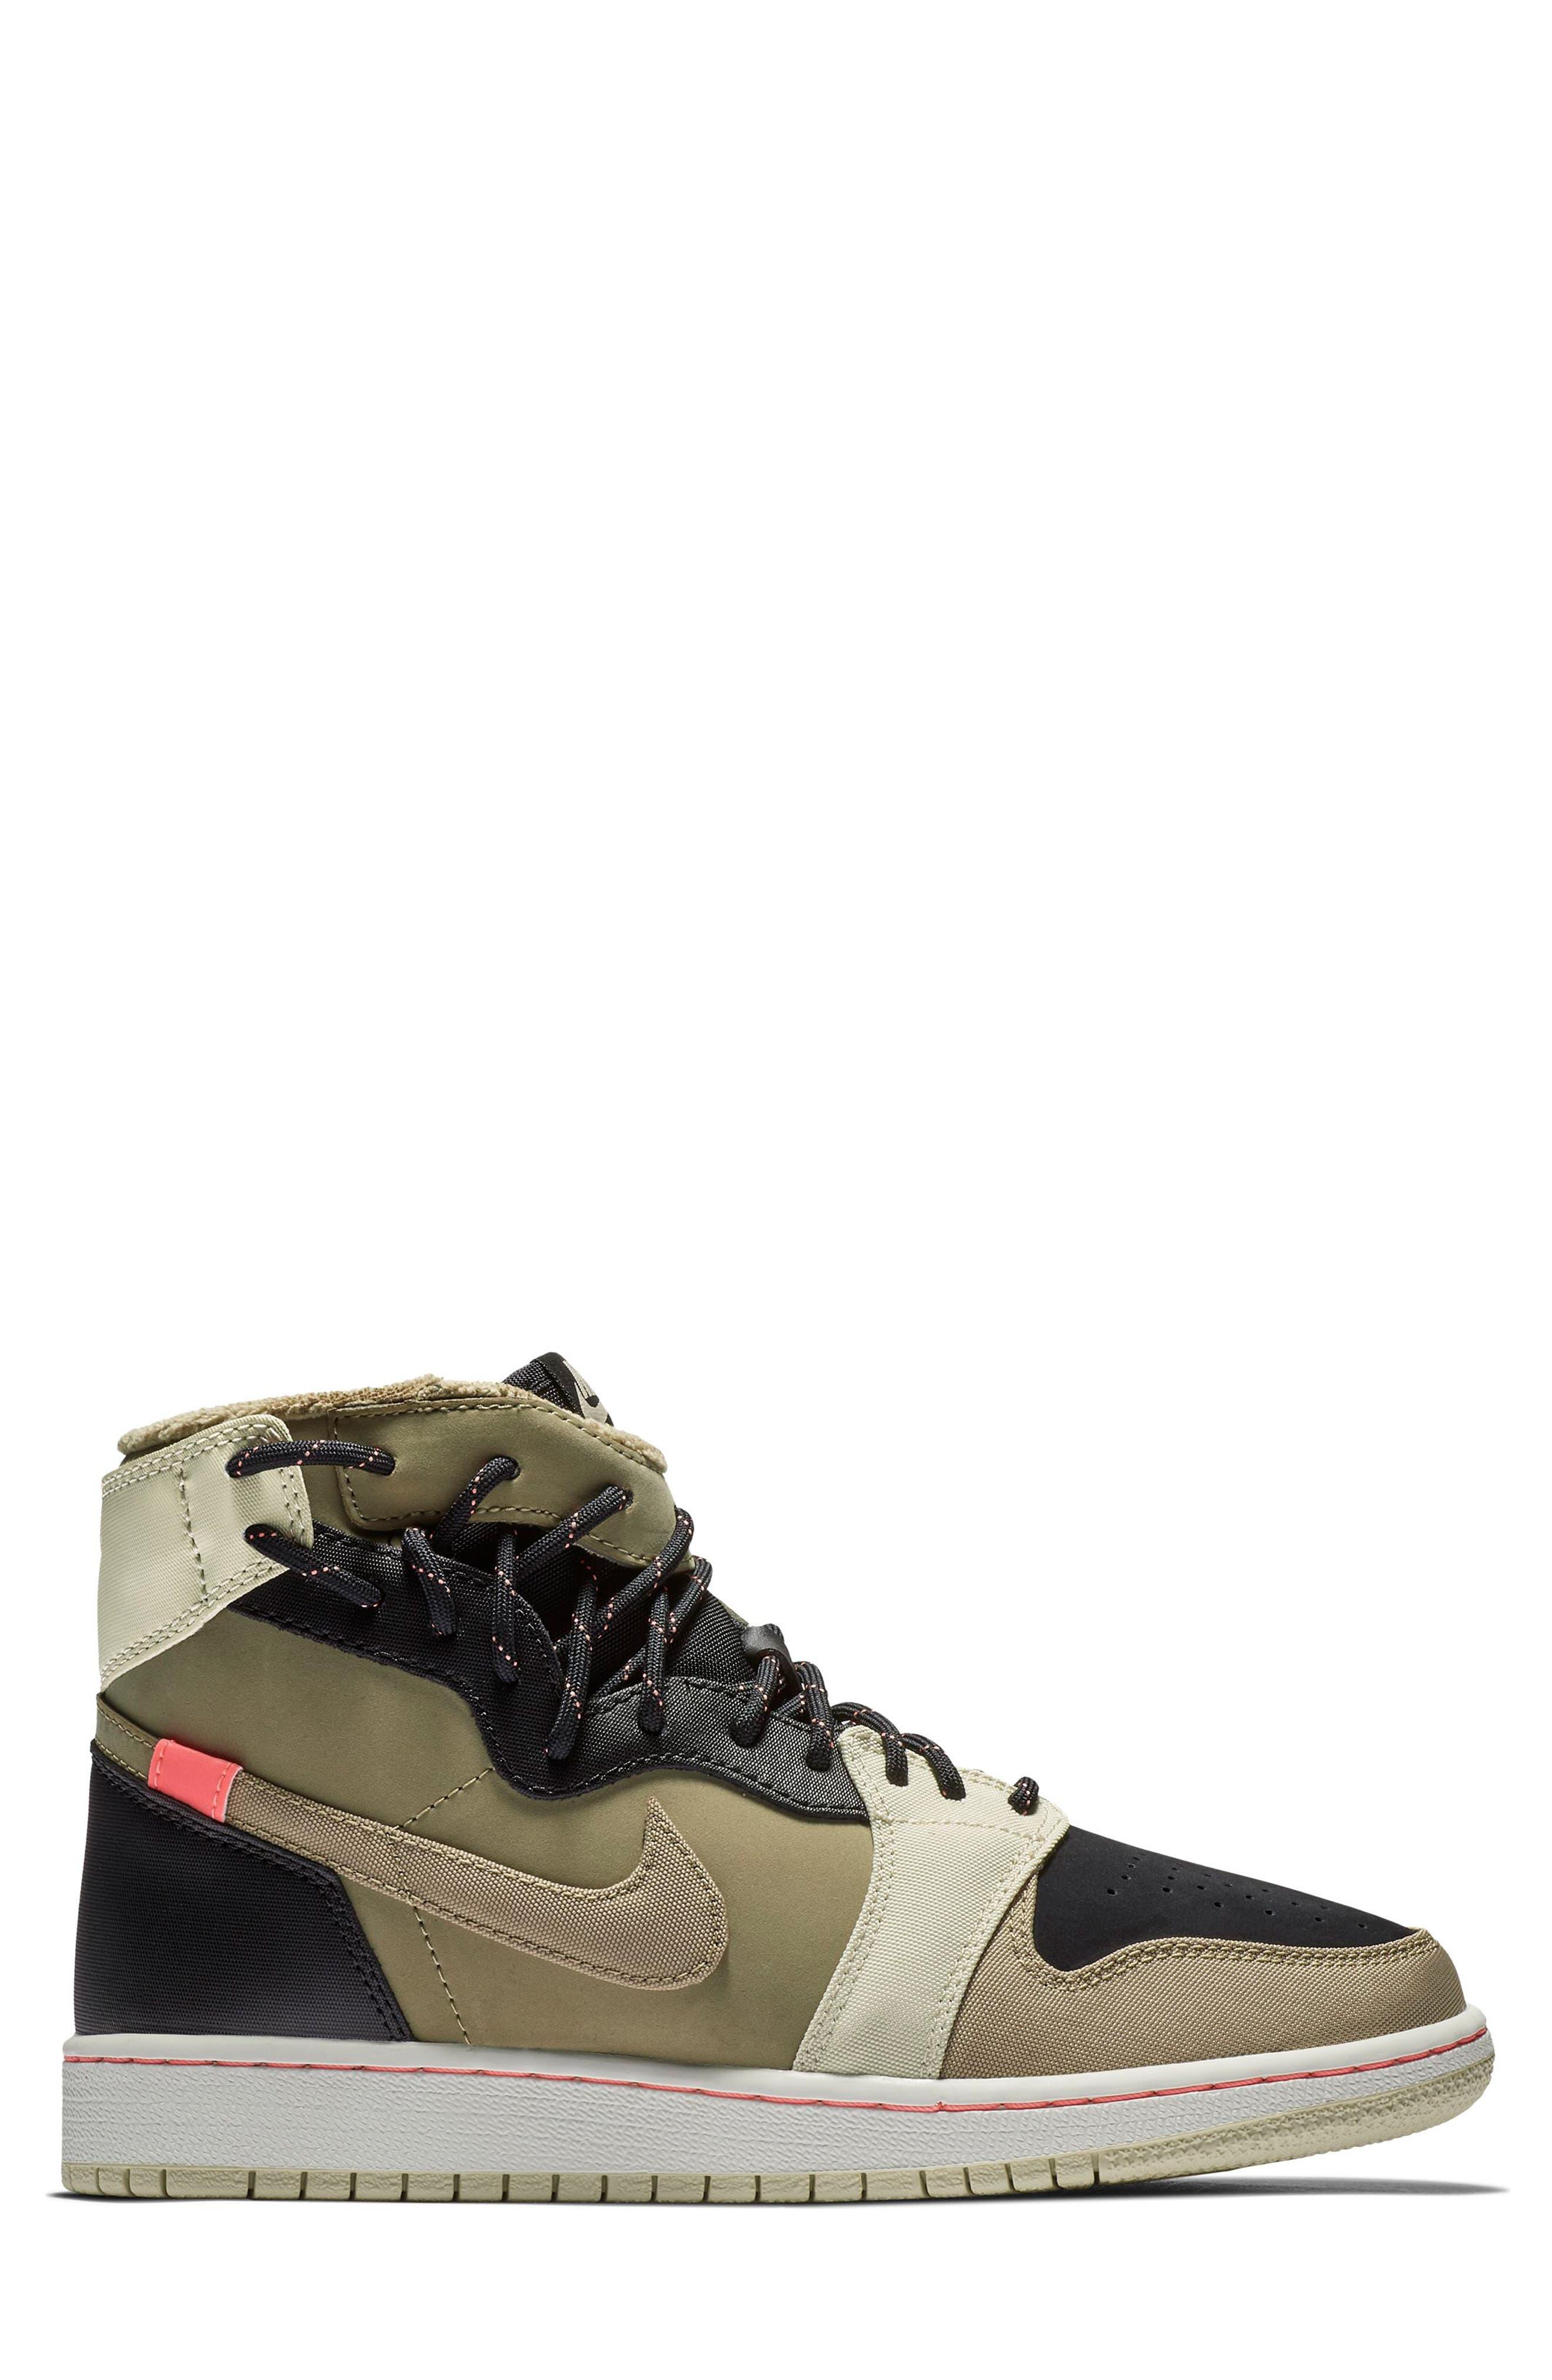 Air Jordan 1 Rebel XX Utility High Top Sneaker,                             Alternate thumbnail 3, color,                             PARACHUTE BEIGE